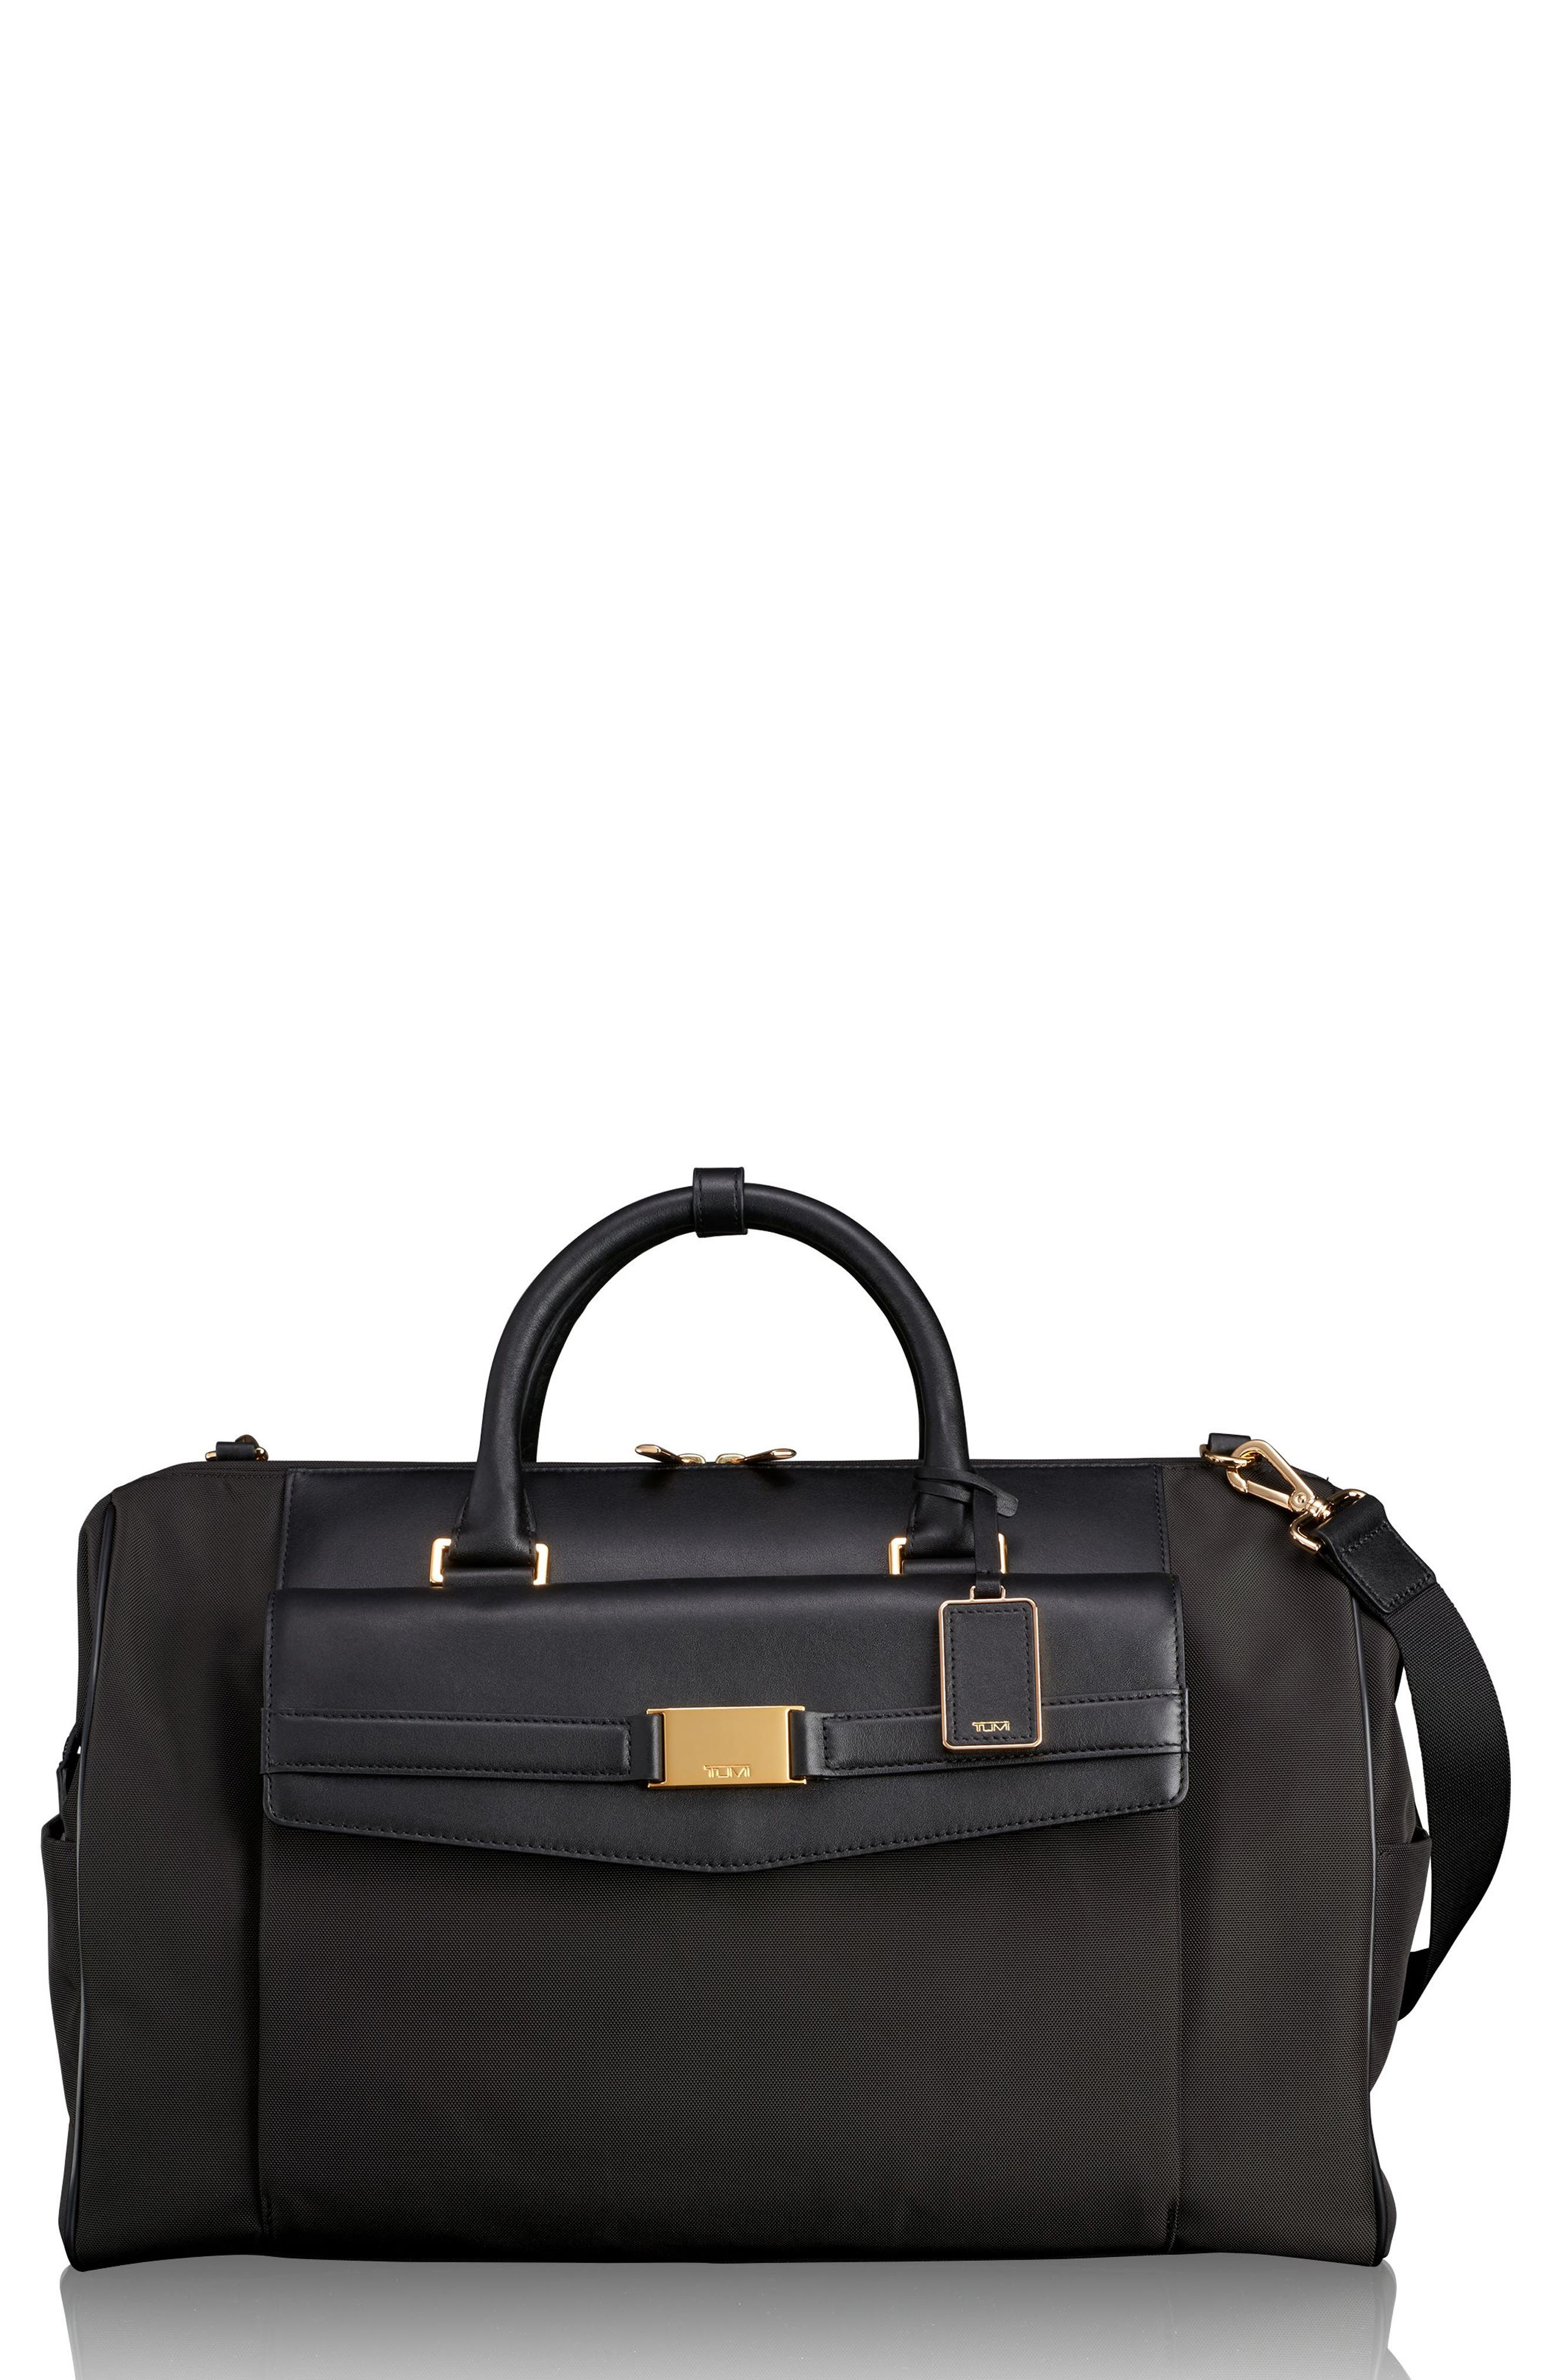 Alternate Image 1 Selected - Tumi Larkin - Allendale Nylon Duffel Bag